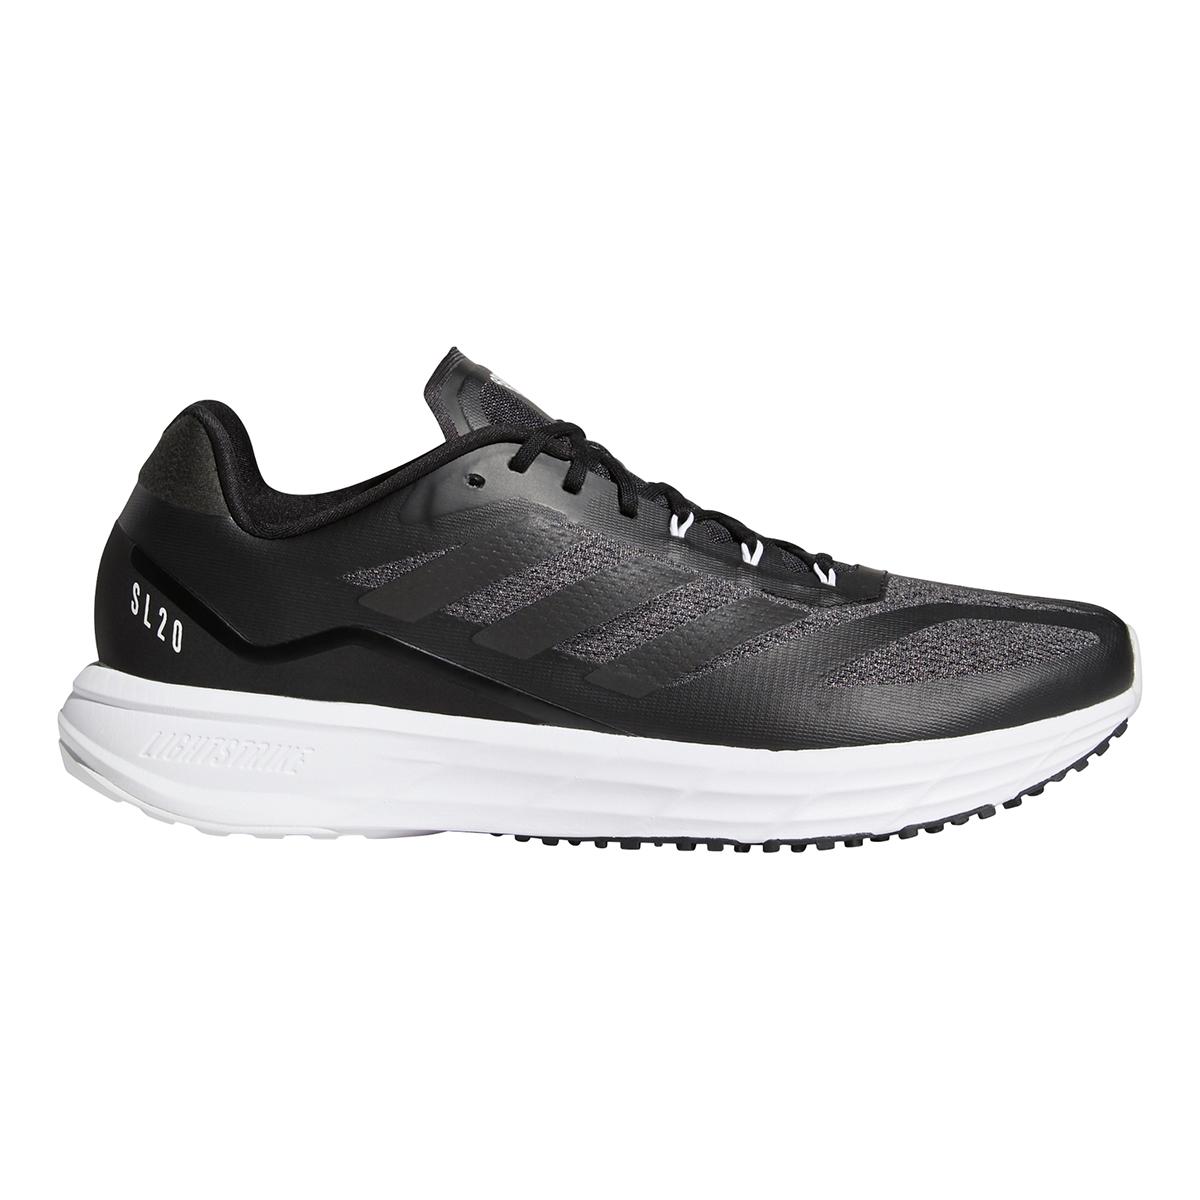 Men's Adidas SL20.2 Running Shoe - Color: Core Black/Grey - Size: 6.5 - Width: Regular, Core Black/Grey, large, image 1